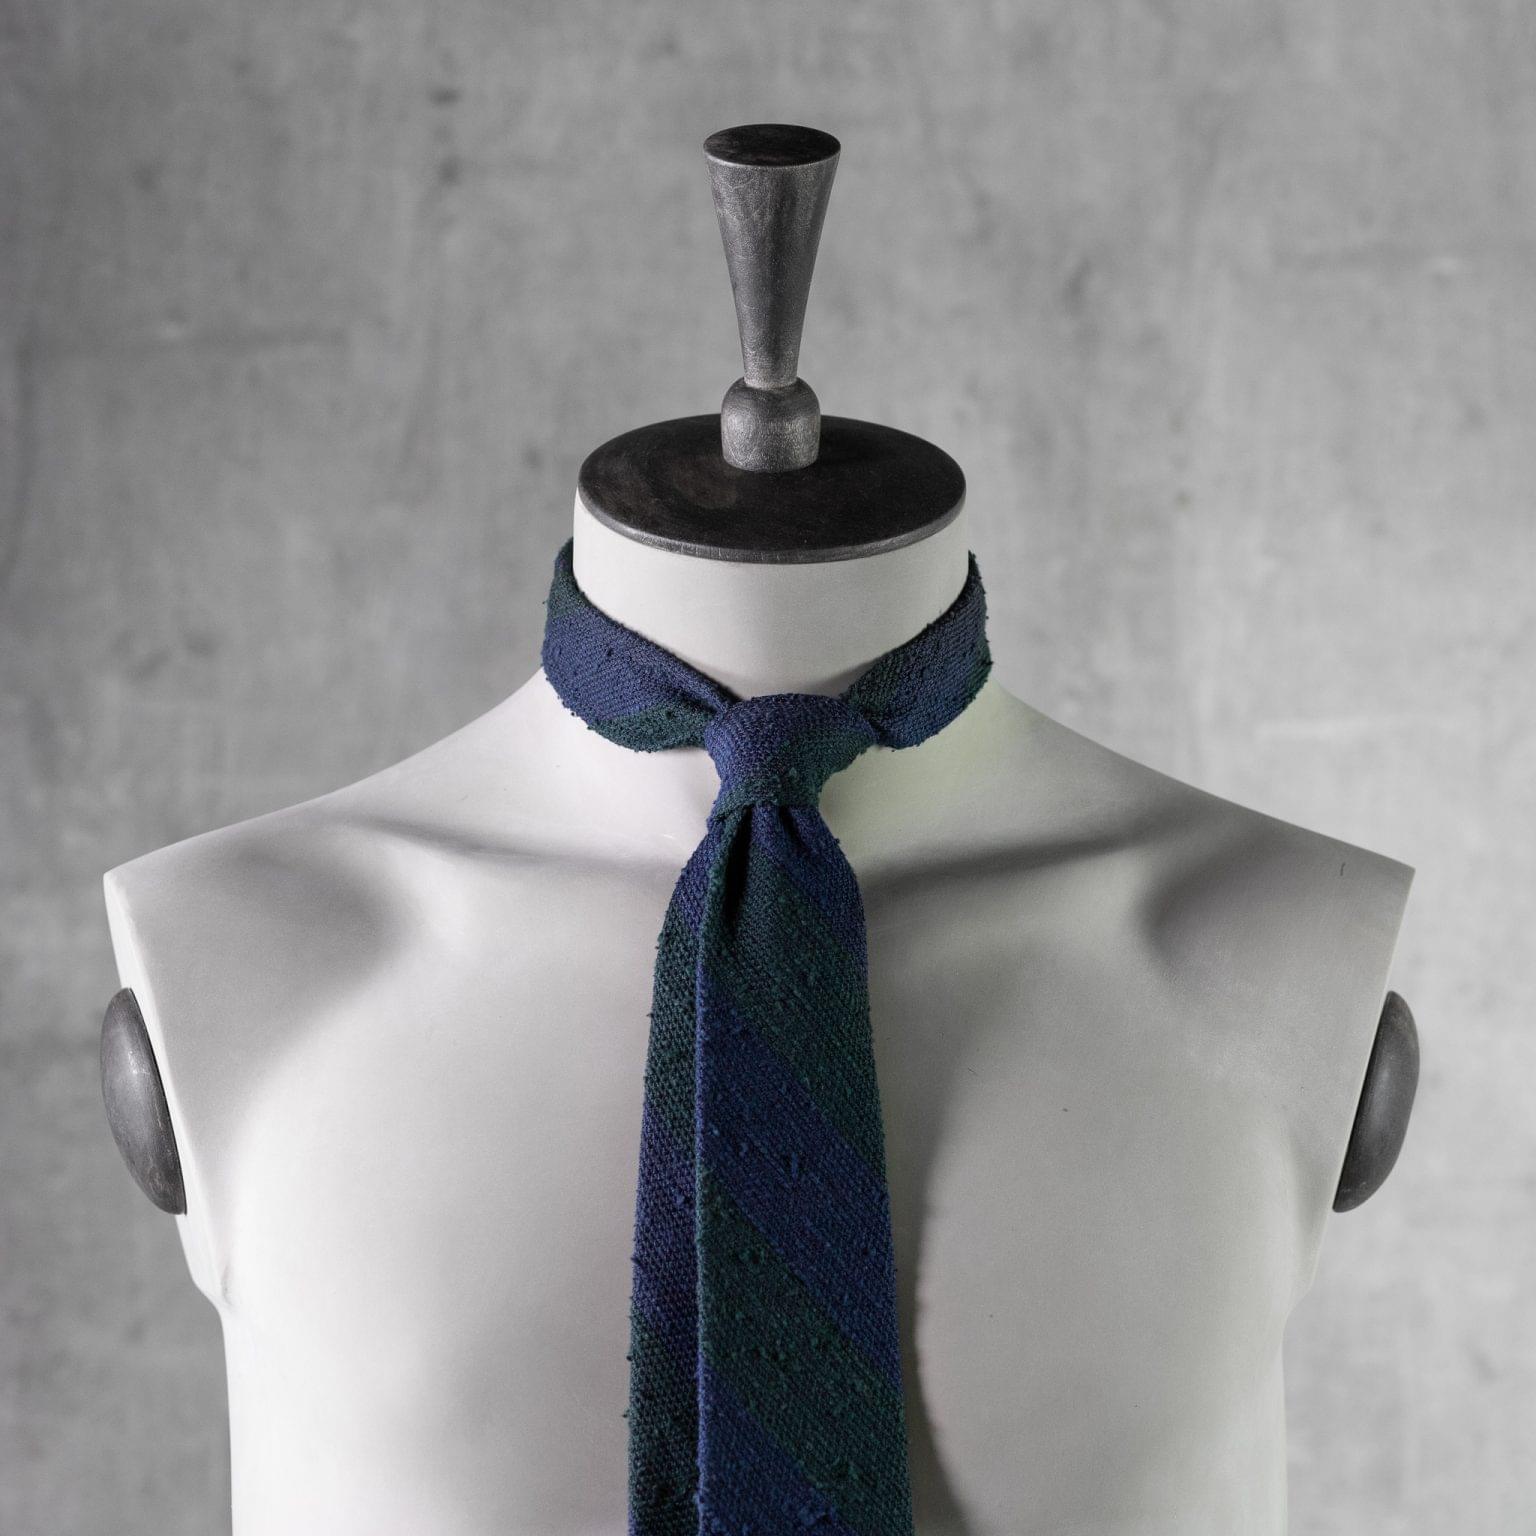 SHANTUNG-0271-Tie-Initials-Corbata-Iniciales-The-Seelk-3